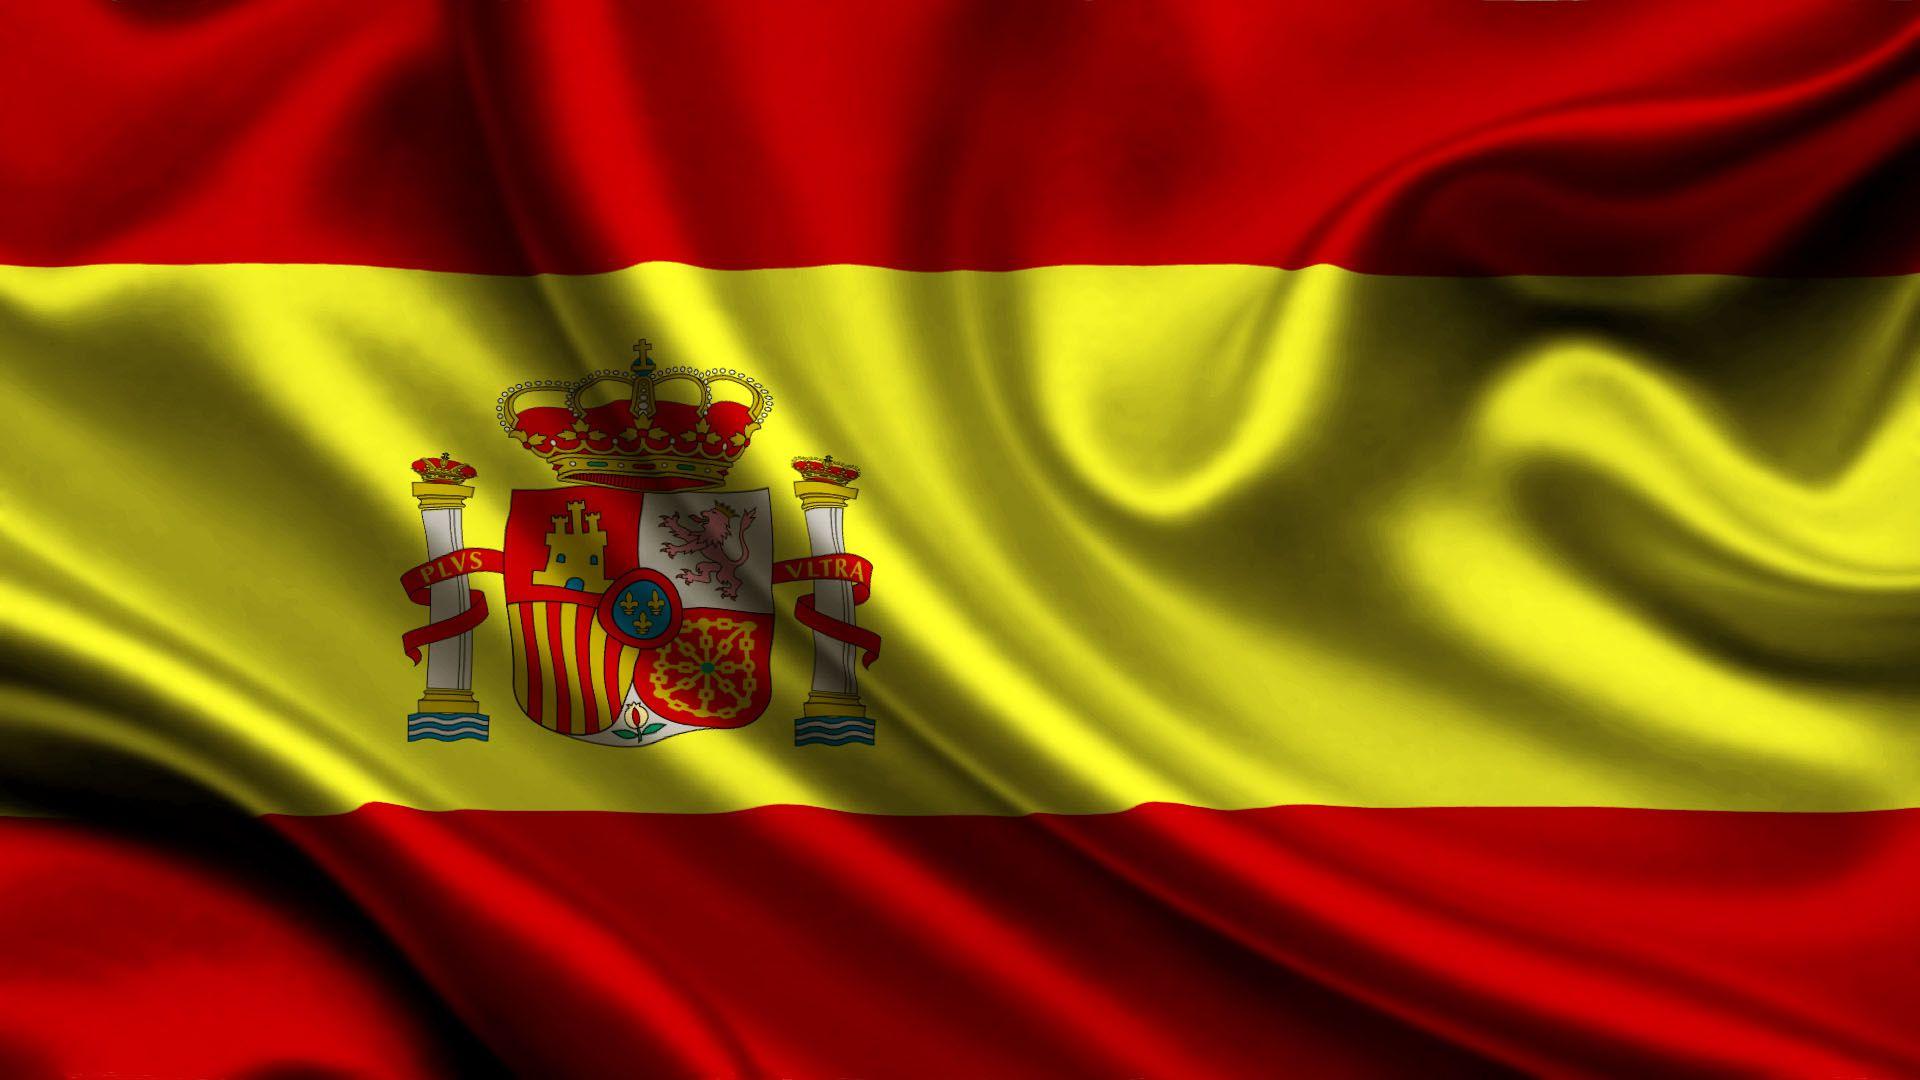 Pin By Sebastjan On Zda Nastanek Spanish Flags Spain Flag Facts